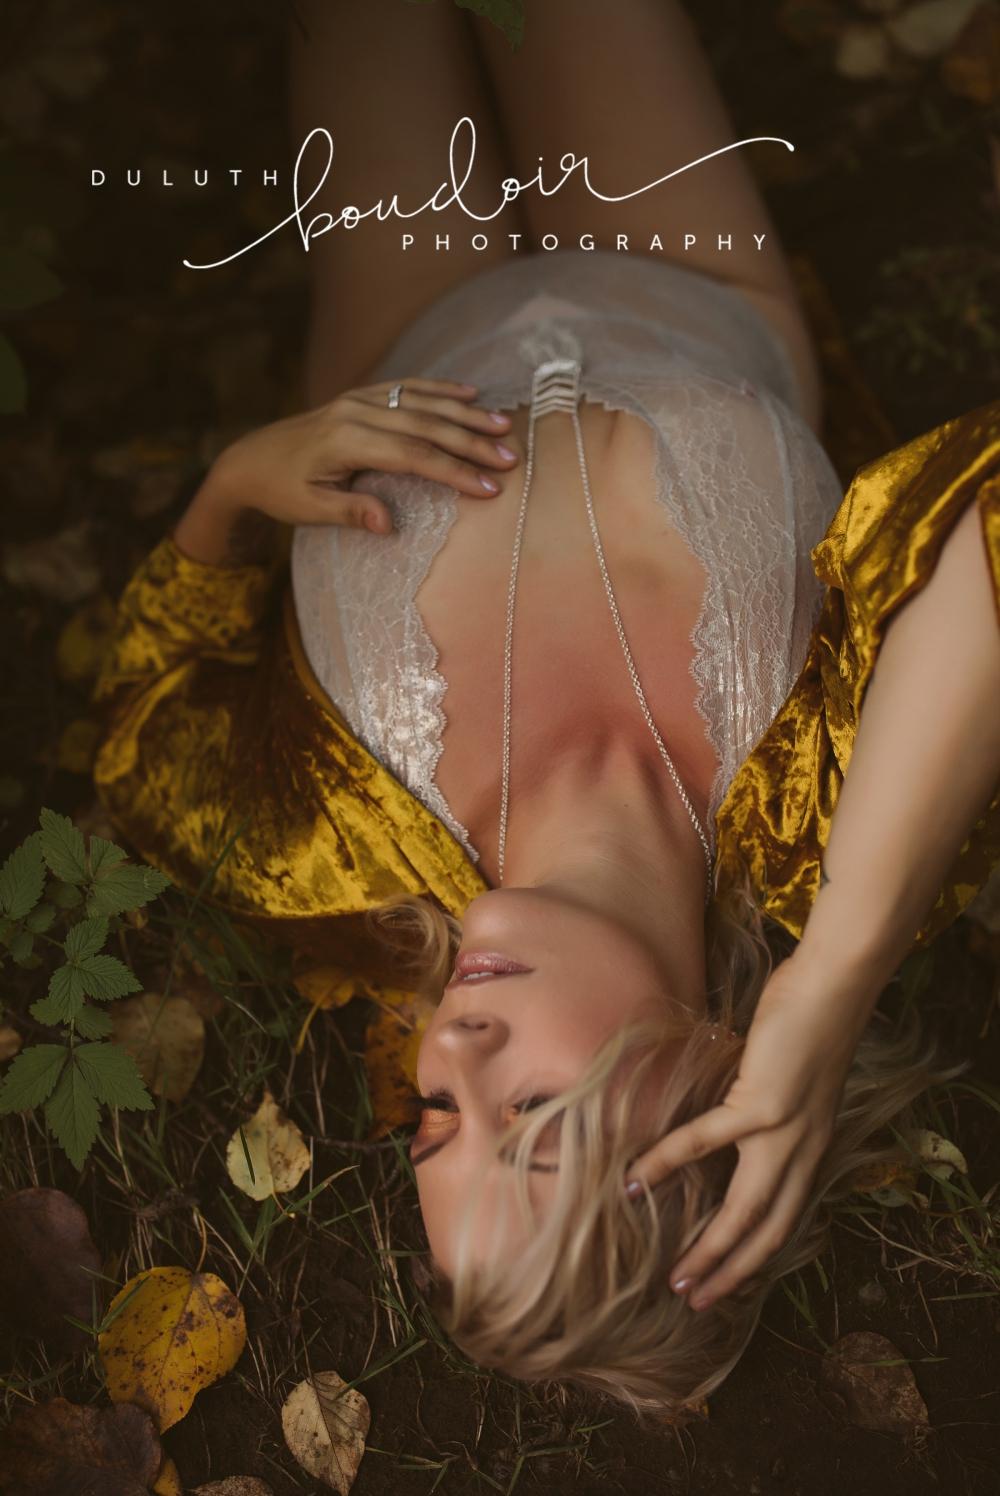 duluth-boudoir-photography-andrea-40